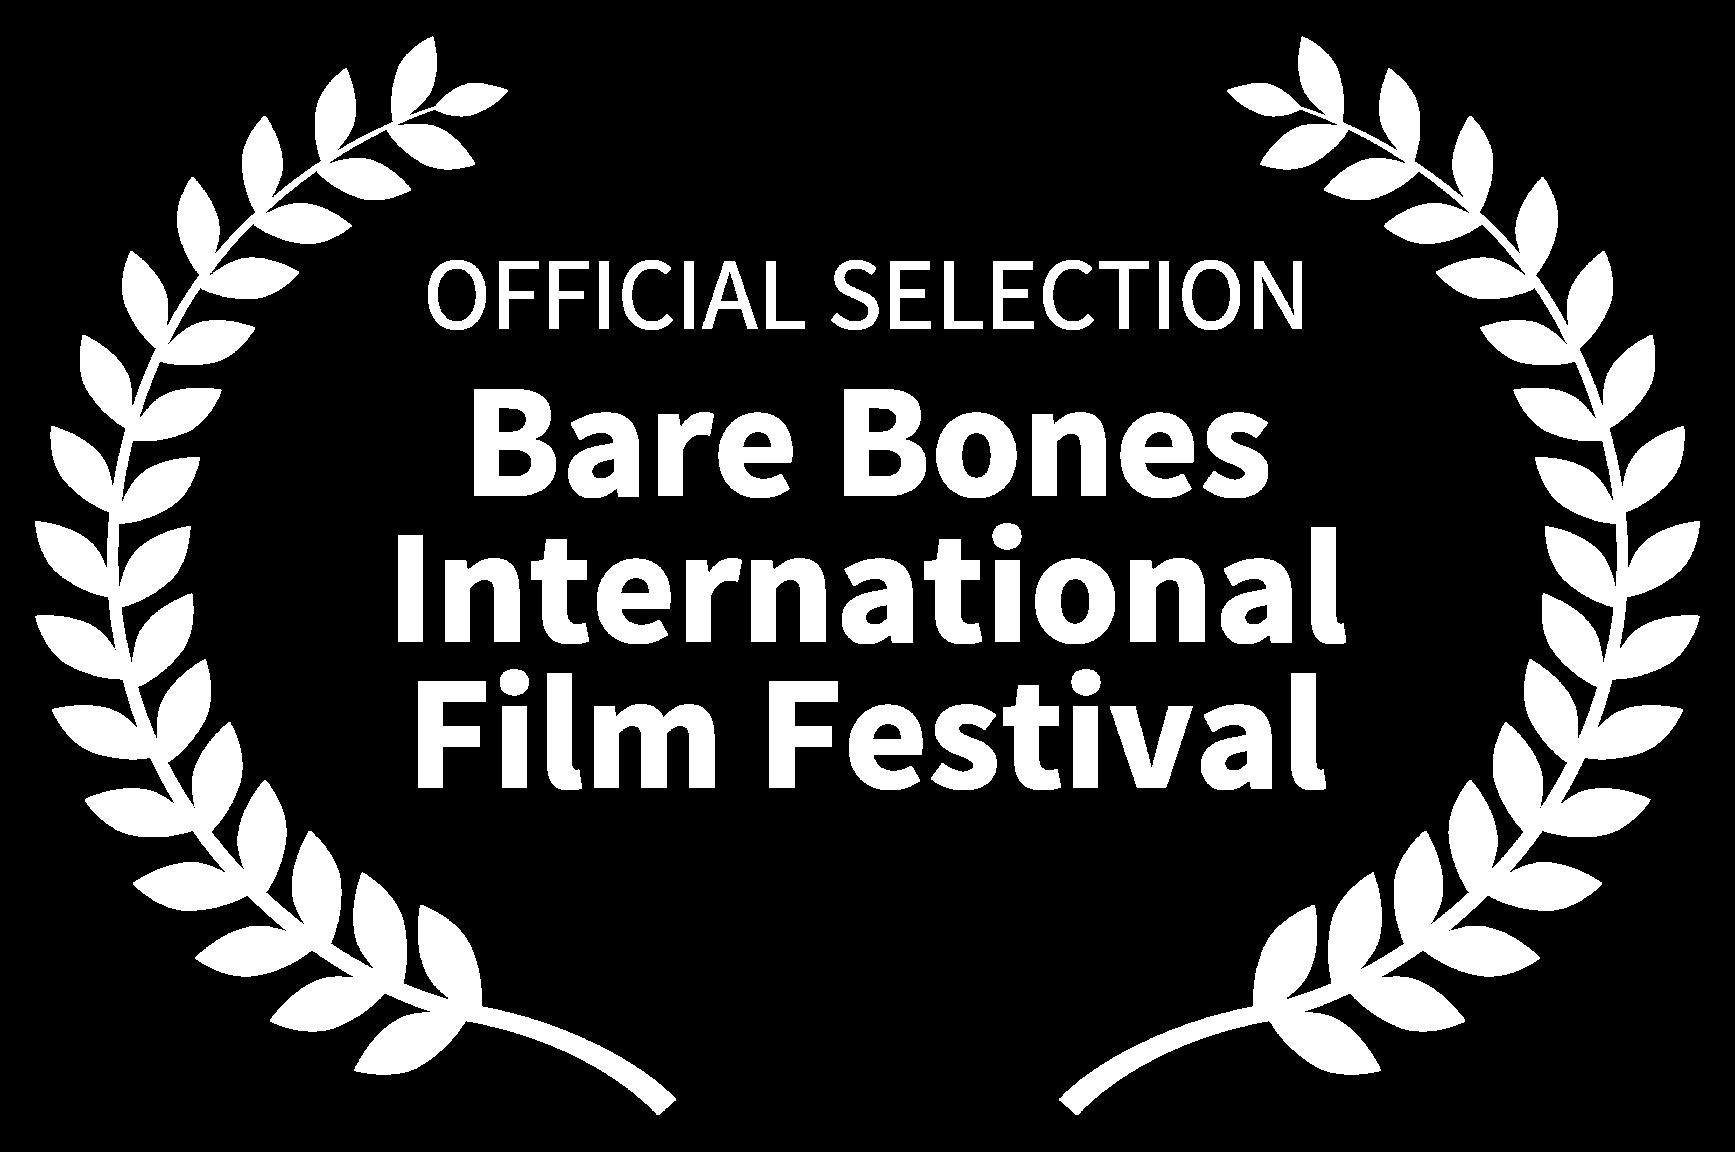 OFFICIAL SELECTION - Bare Bones International Film Festival